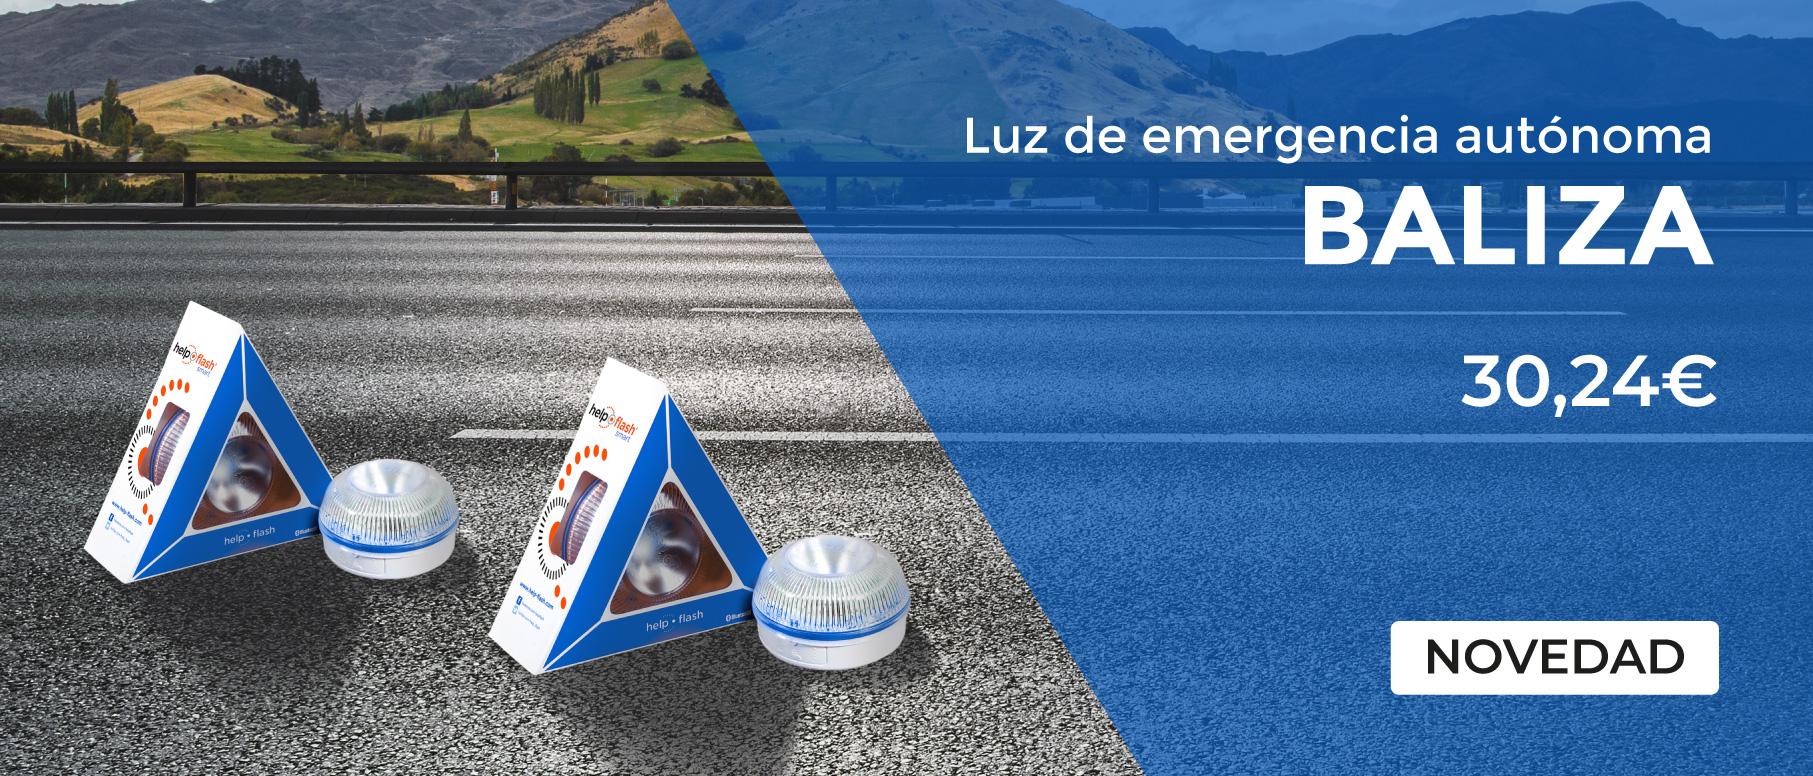 Banner Ecommerce Ecotisa Balizas azules